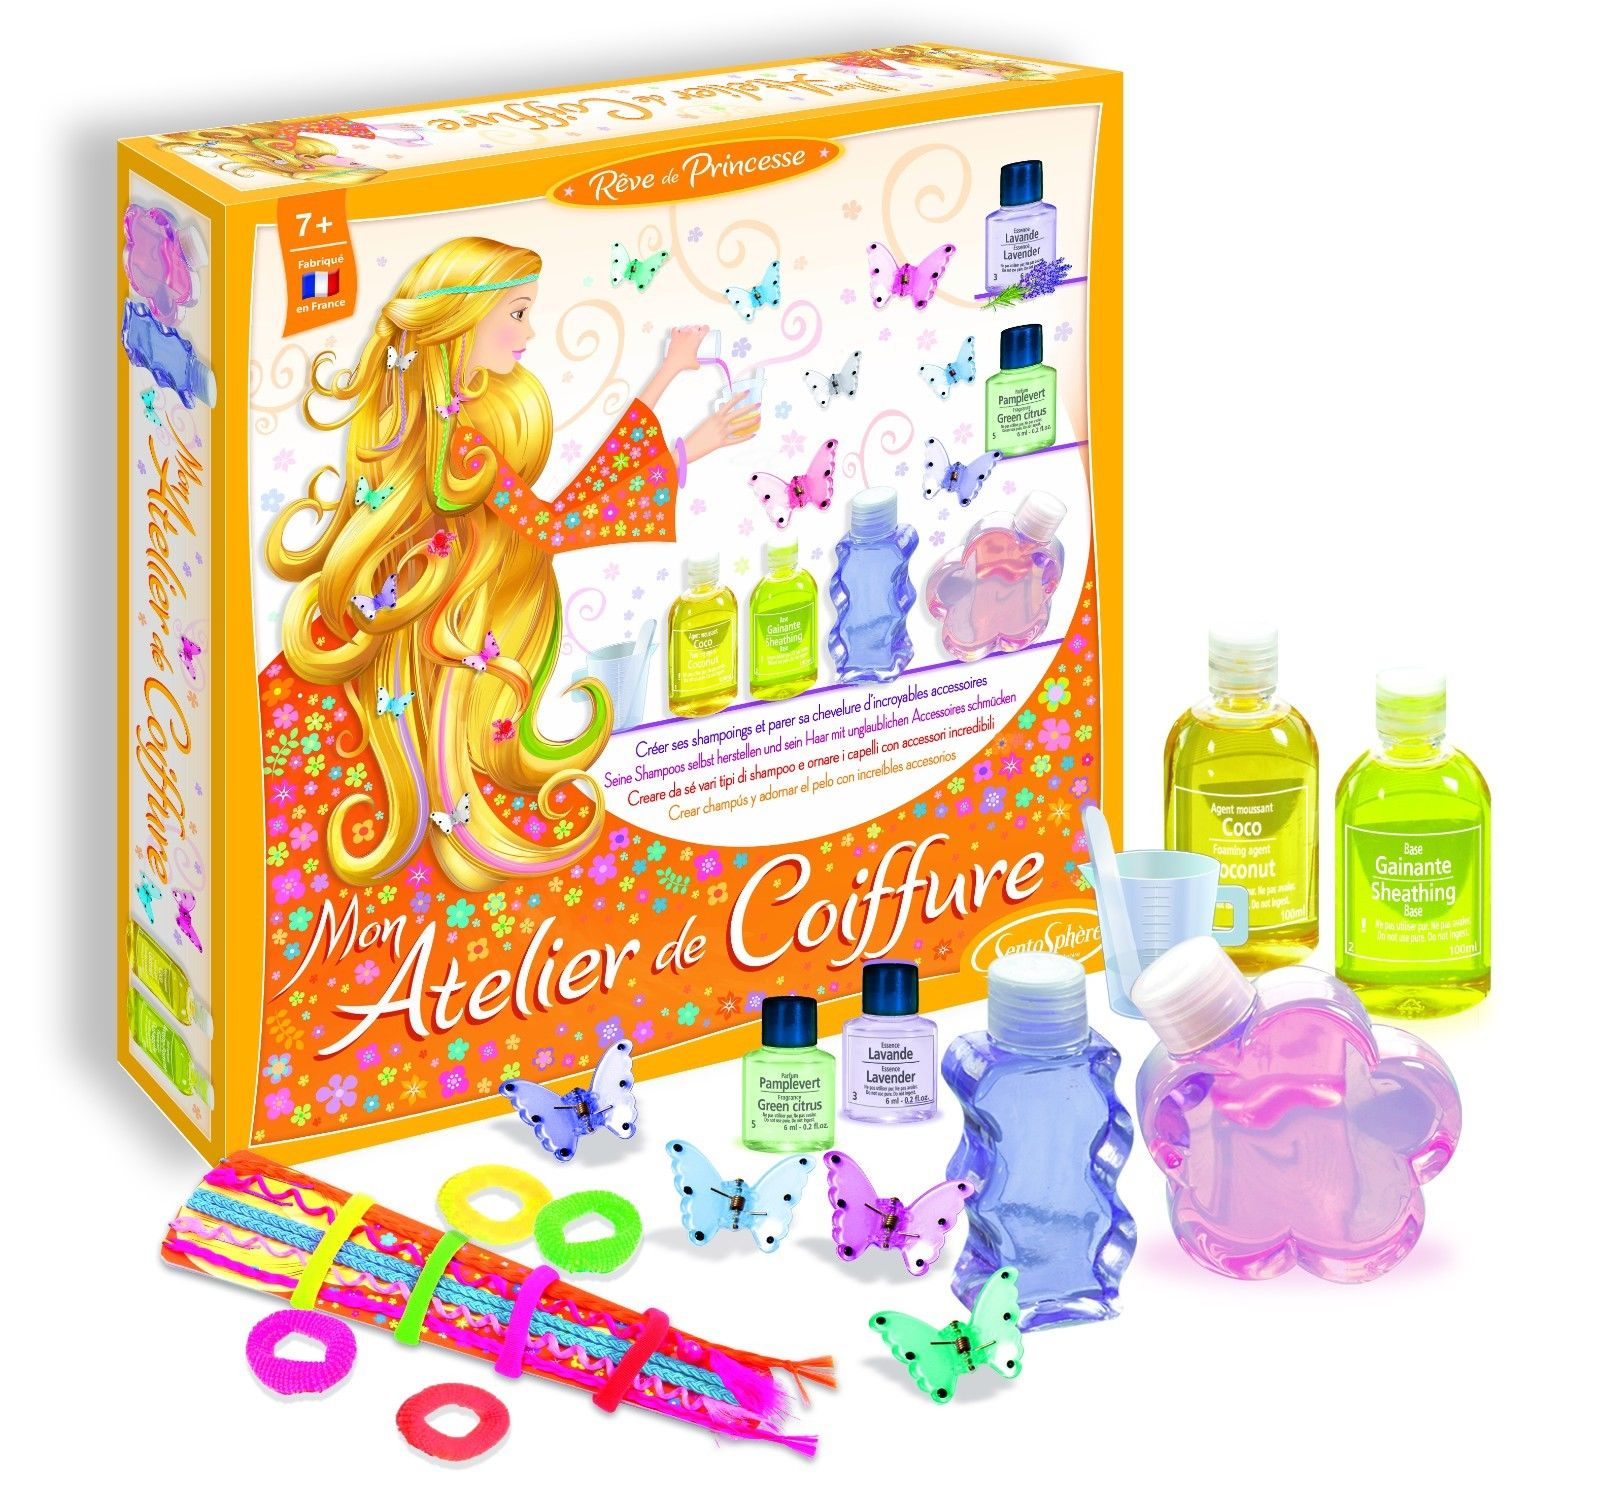 Set de coafor pentru copii - Mon Atelier de Coiffure thumbnail